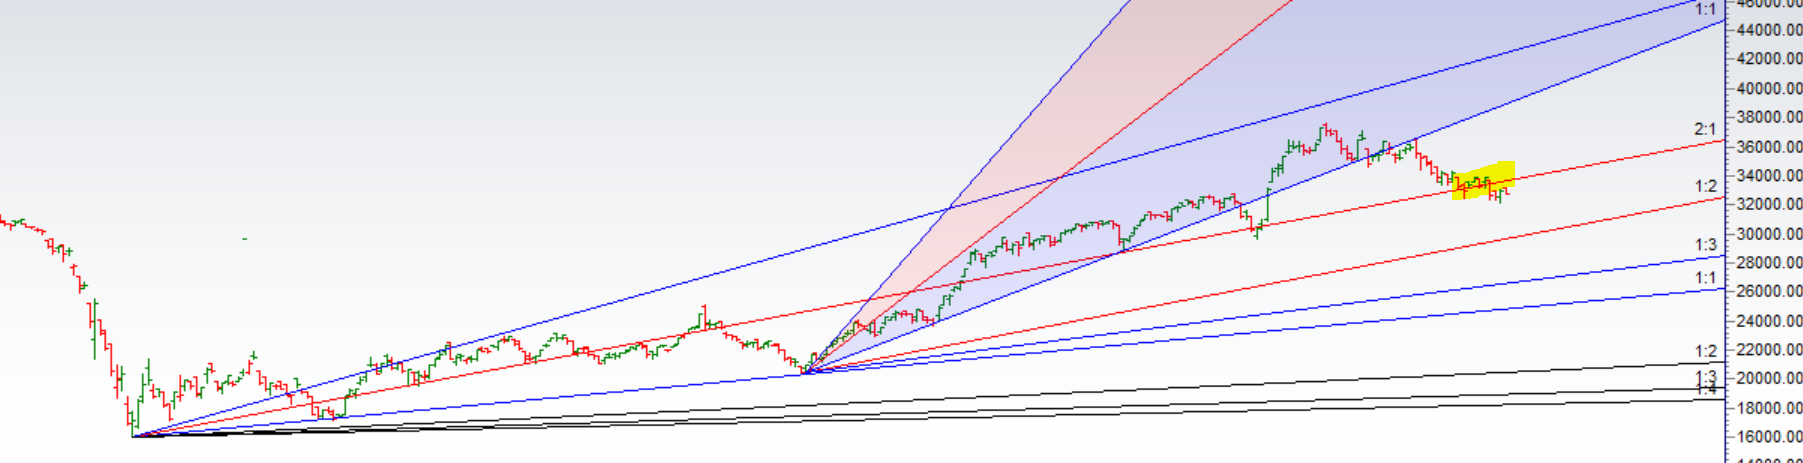 Bank Nifty Analysis for 09 April